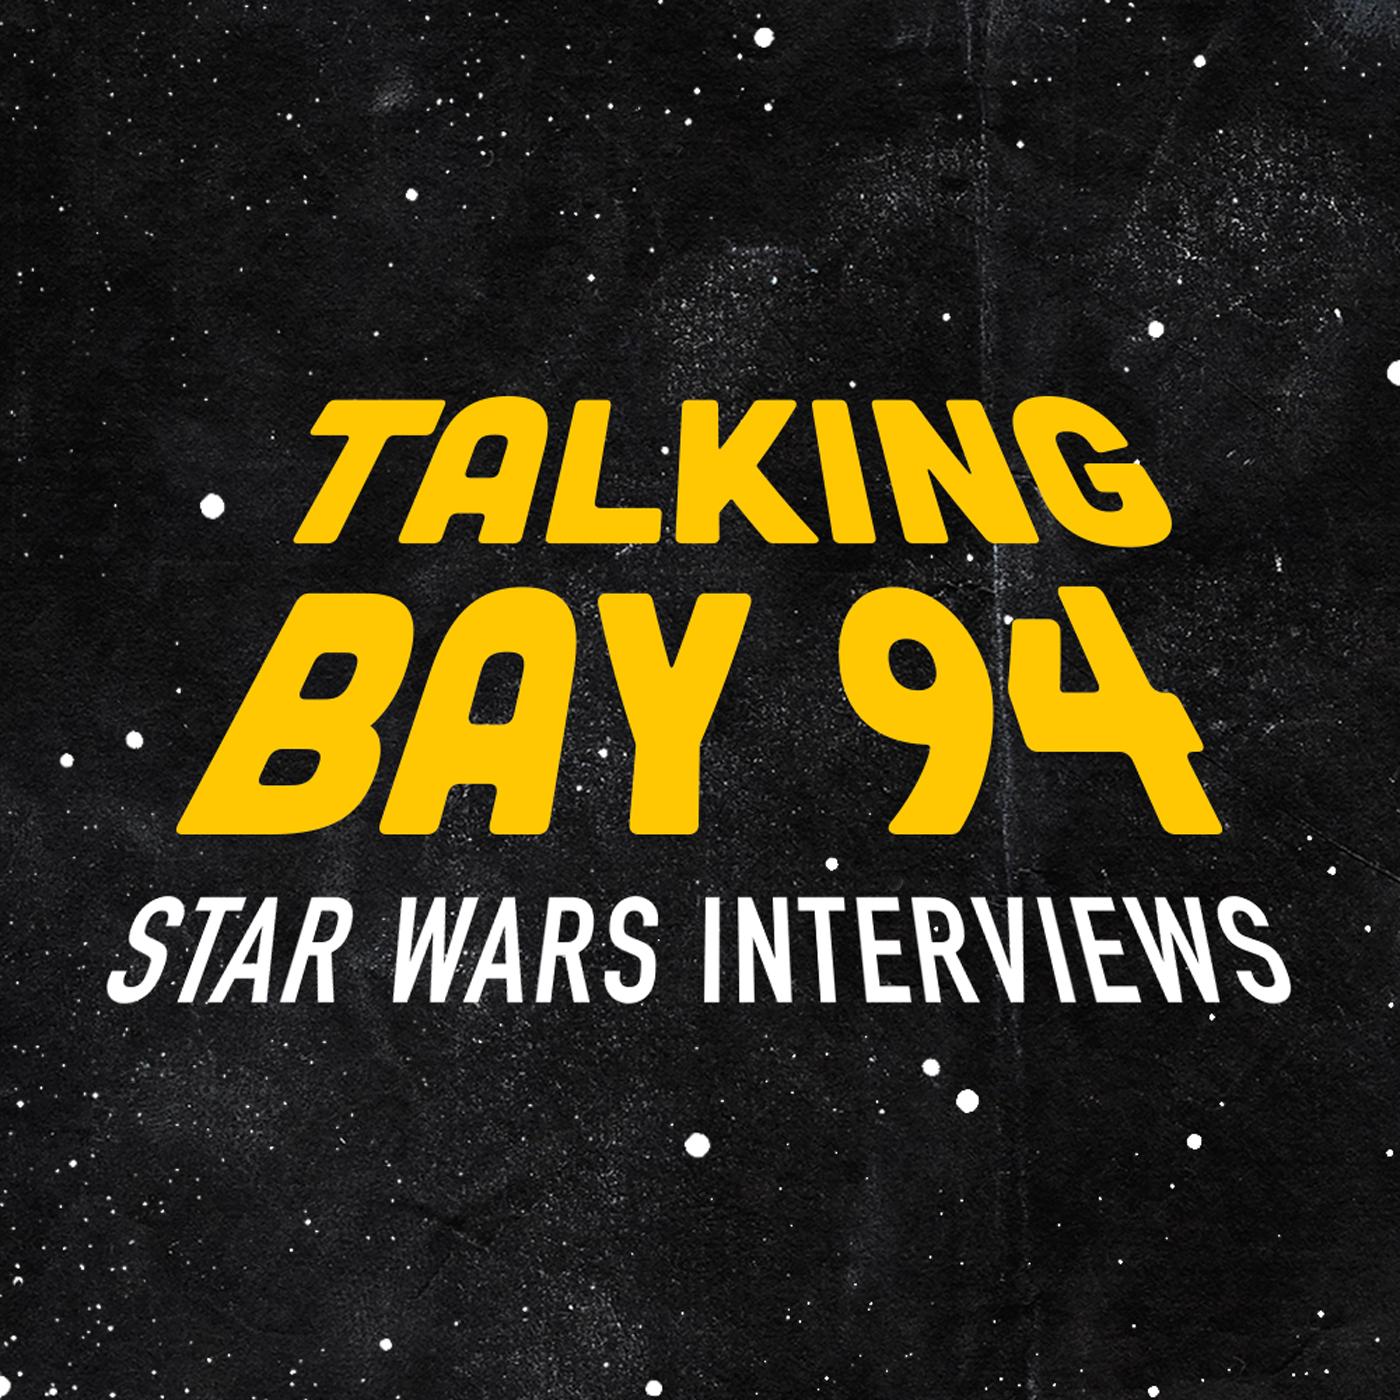 Talking Bay 94: Star Wars Interviews show art